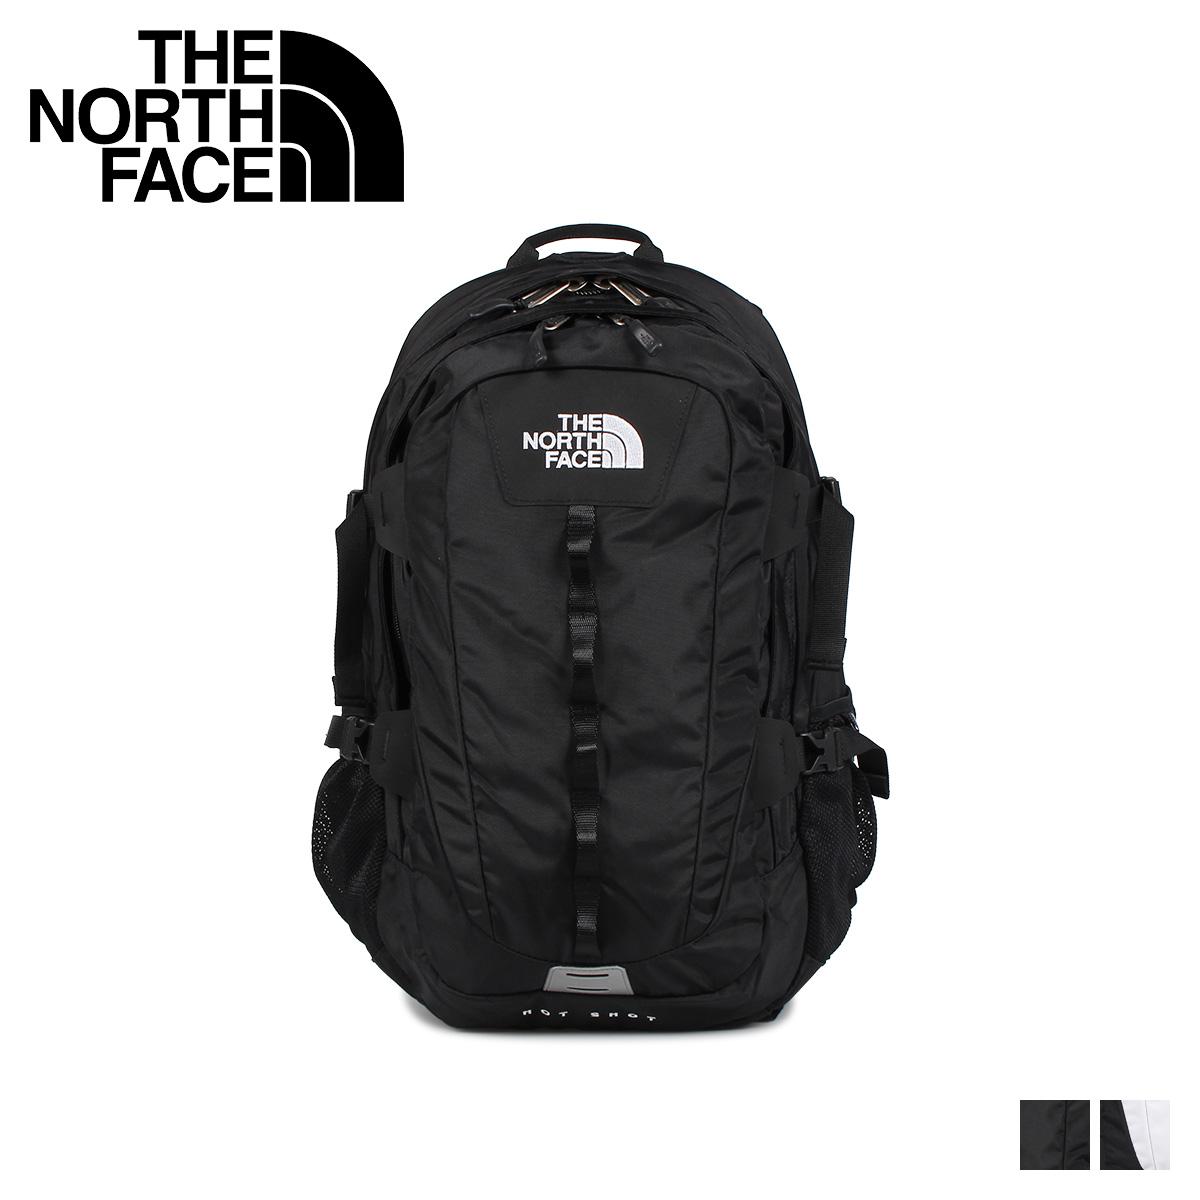 THE NORTH FACE 26L HOT SHOT CLASSIC ノースフェイス リュック バッグ バックパック ホットショット メンズ レディース ブラック ホワイト 黒 白 NM71862